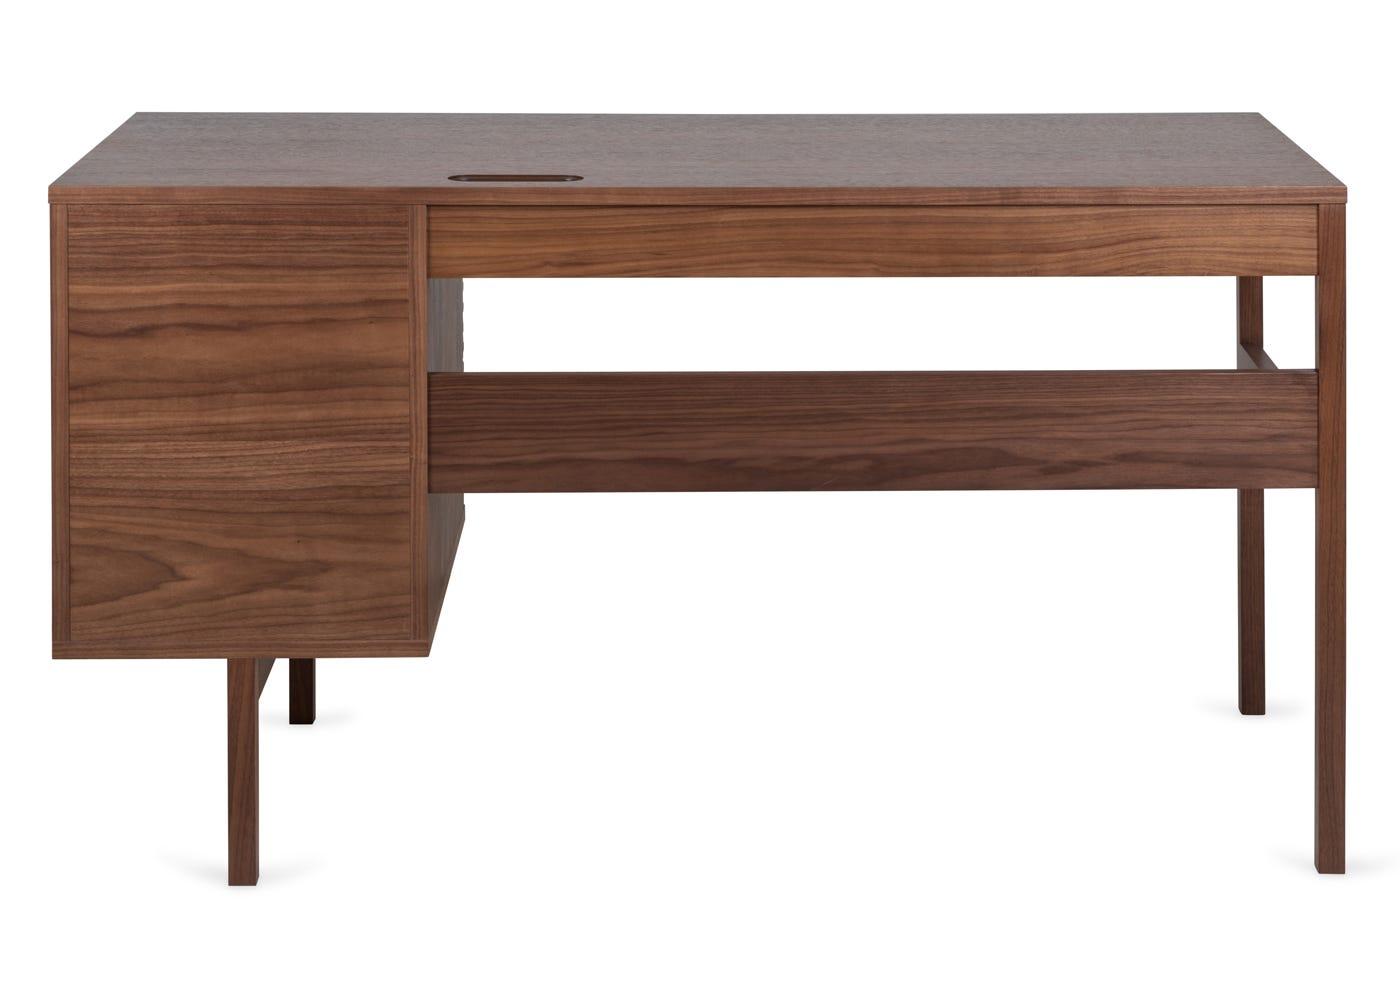 Verona desk in walnut - Rear profile.